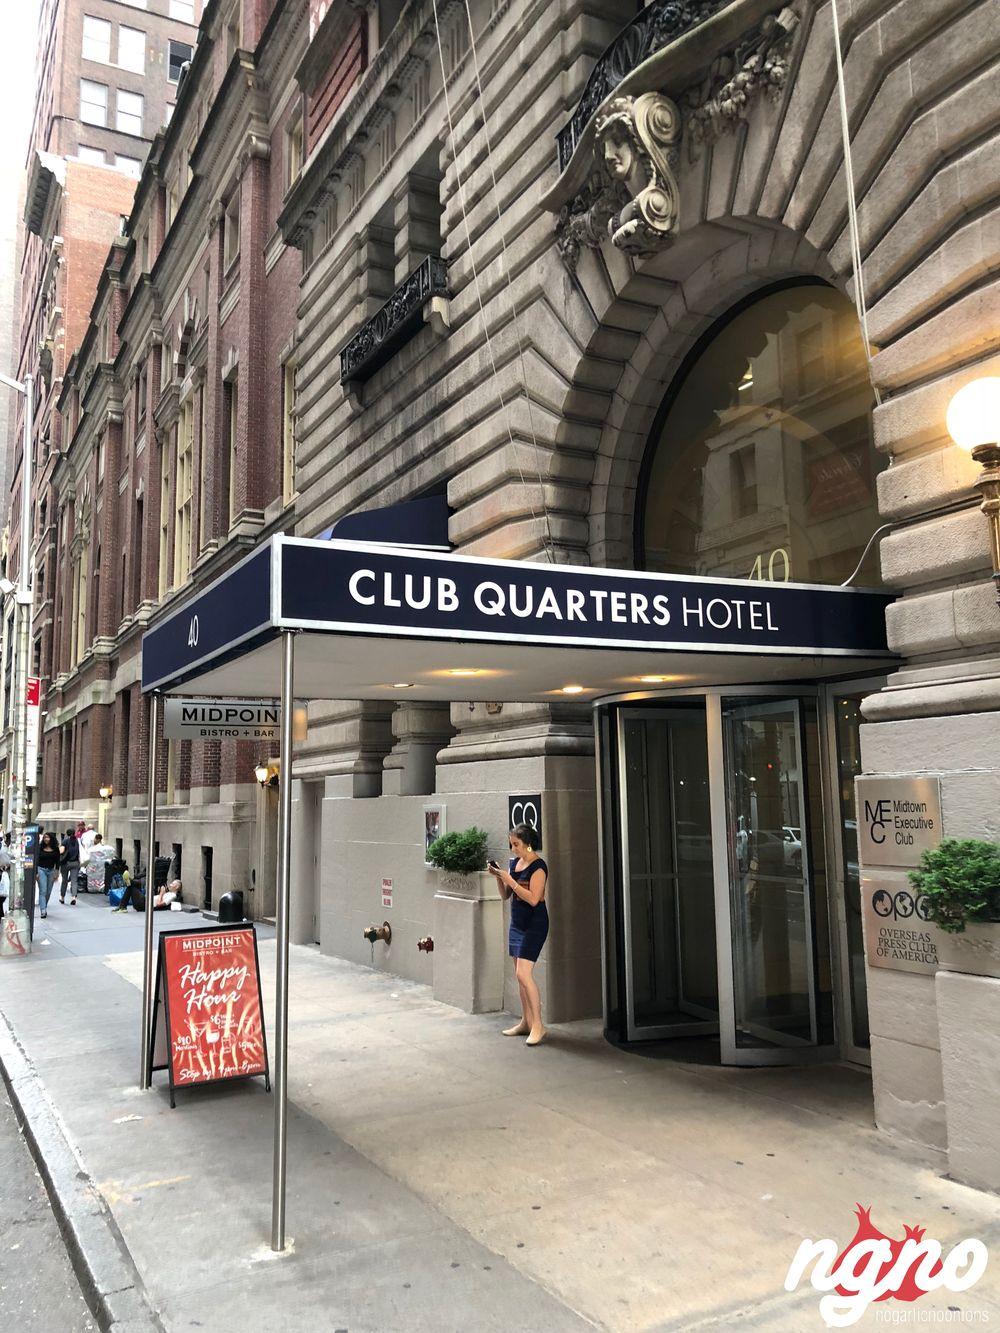 club-quarters-hotel-nogarlicnoonions-362018-08-24-10-03-44